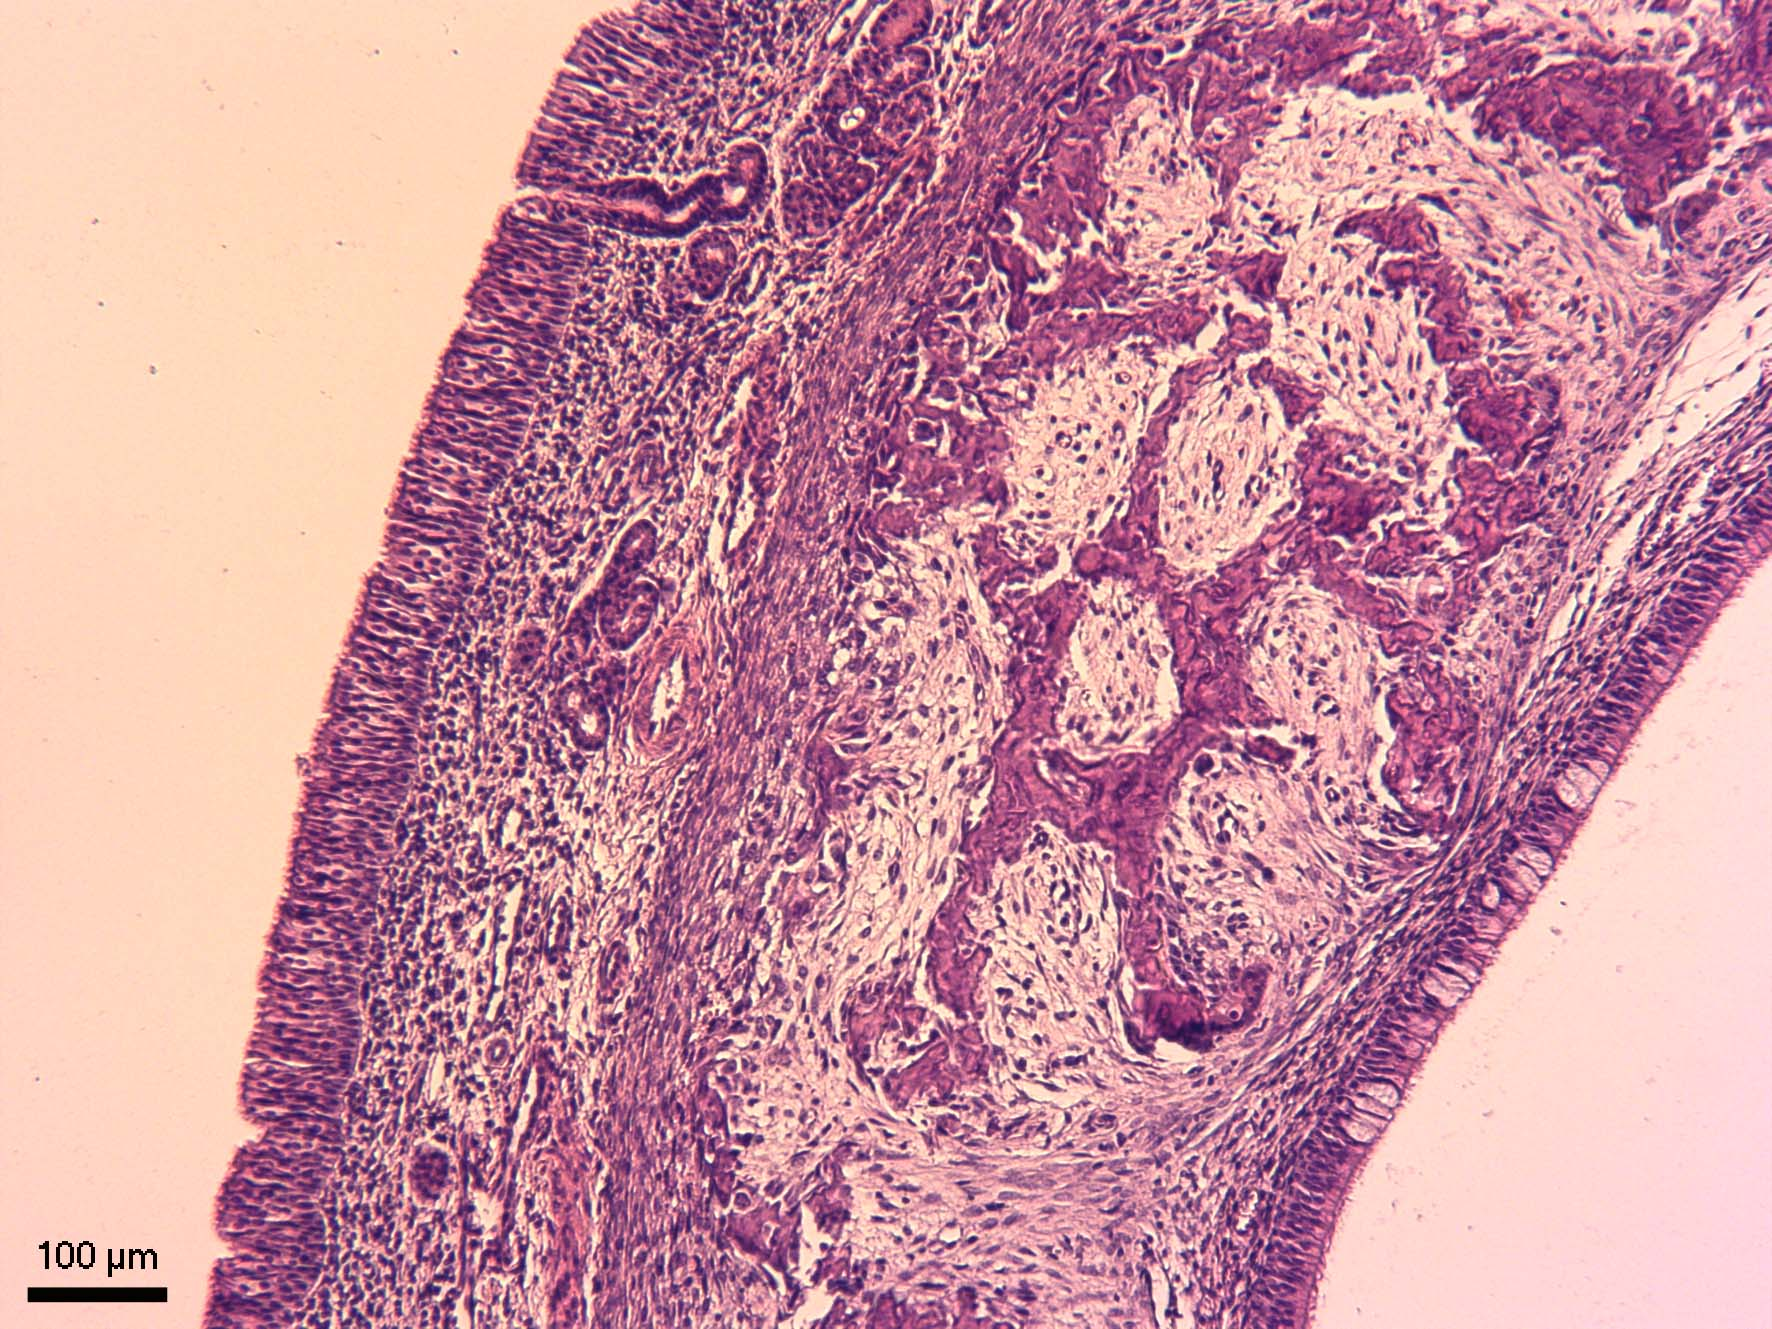 Dýchací okrsek nosní sliznice (regio respiratoria tunicae mucosae nasi)